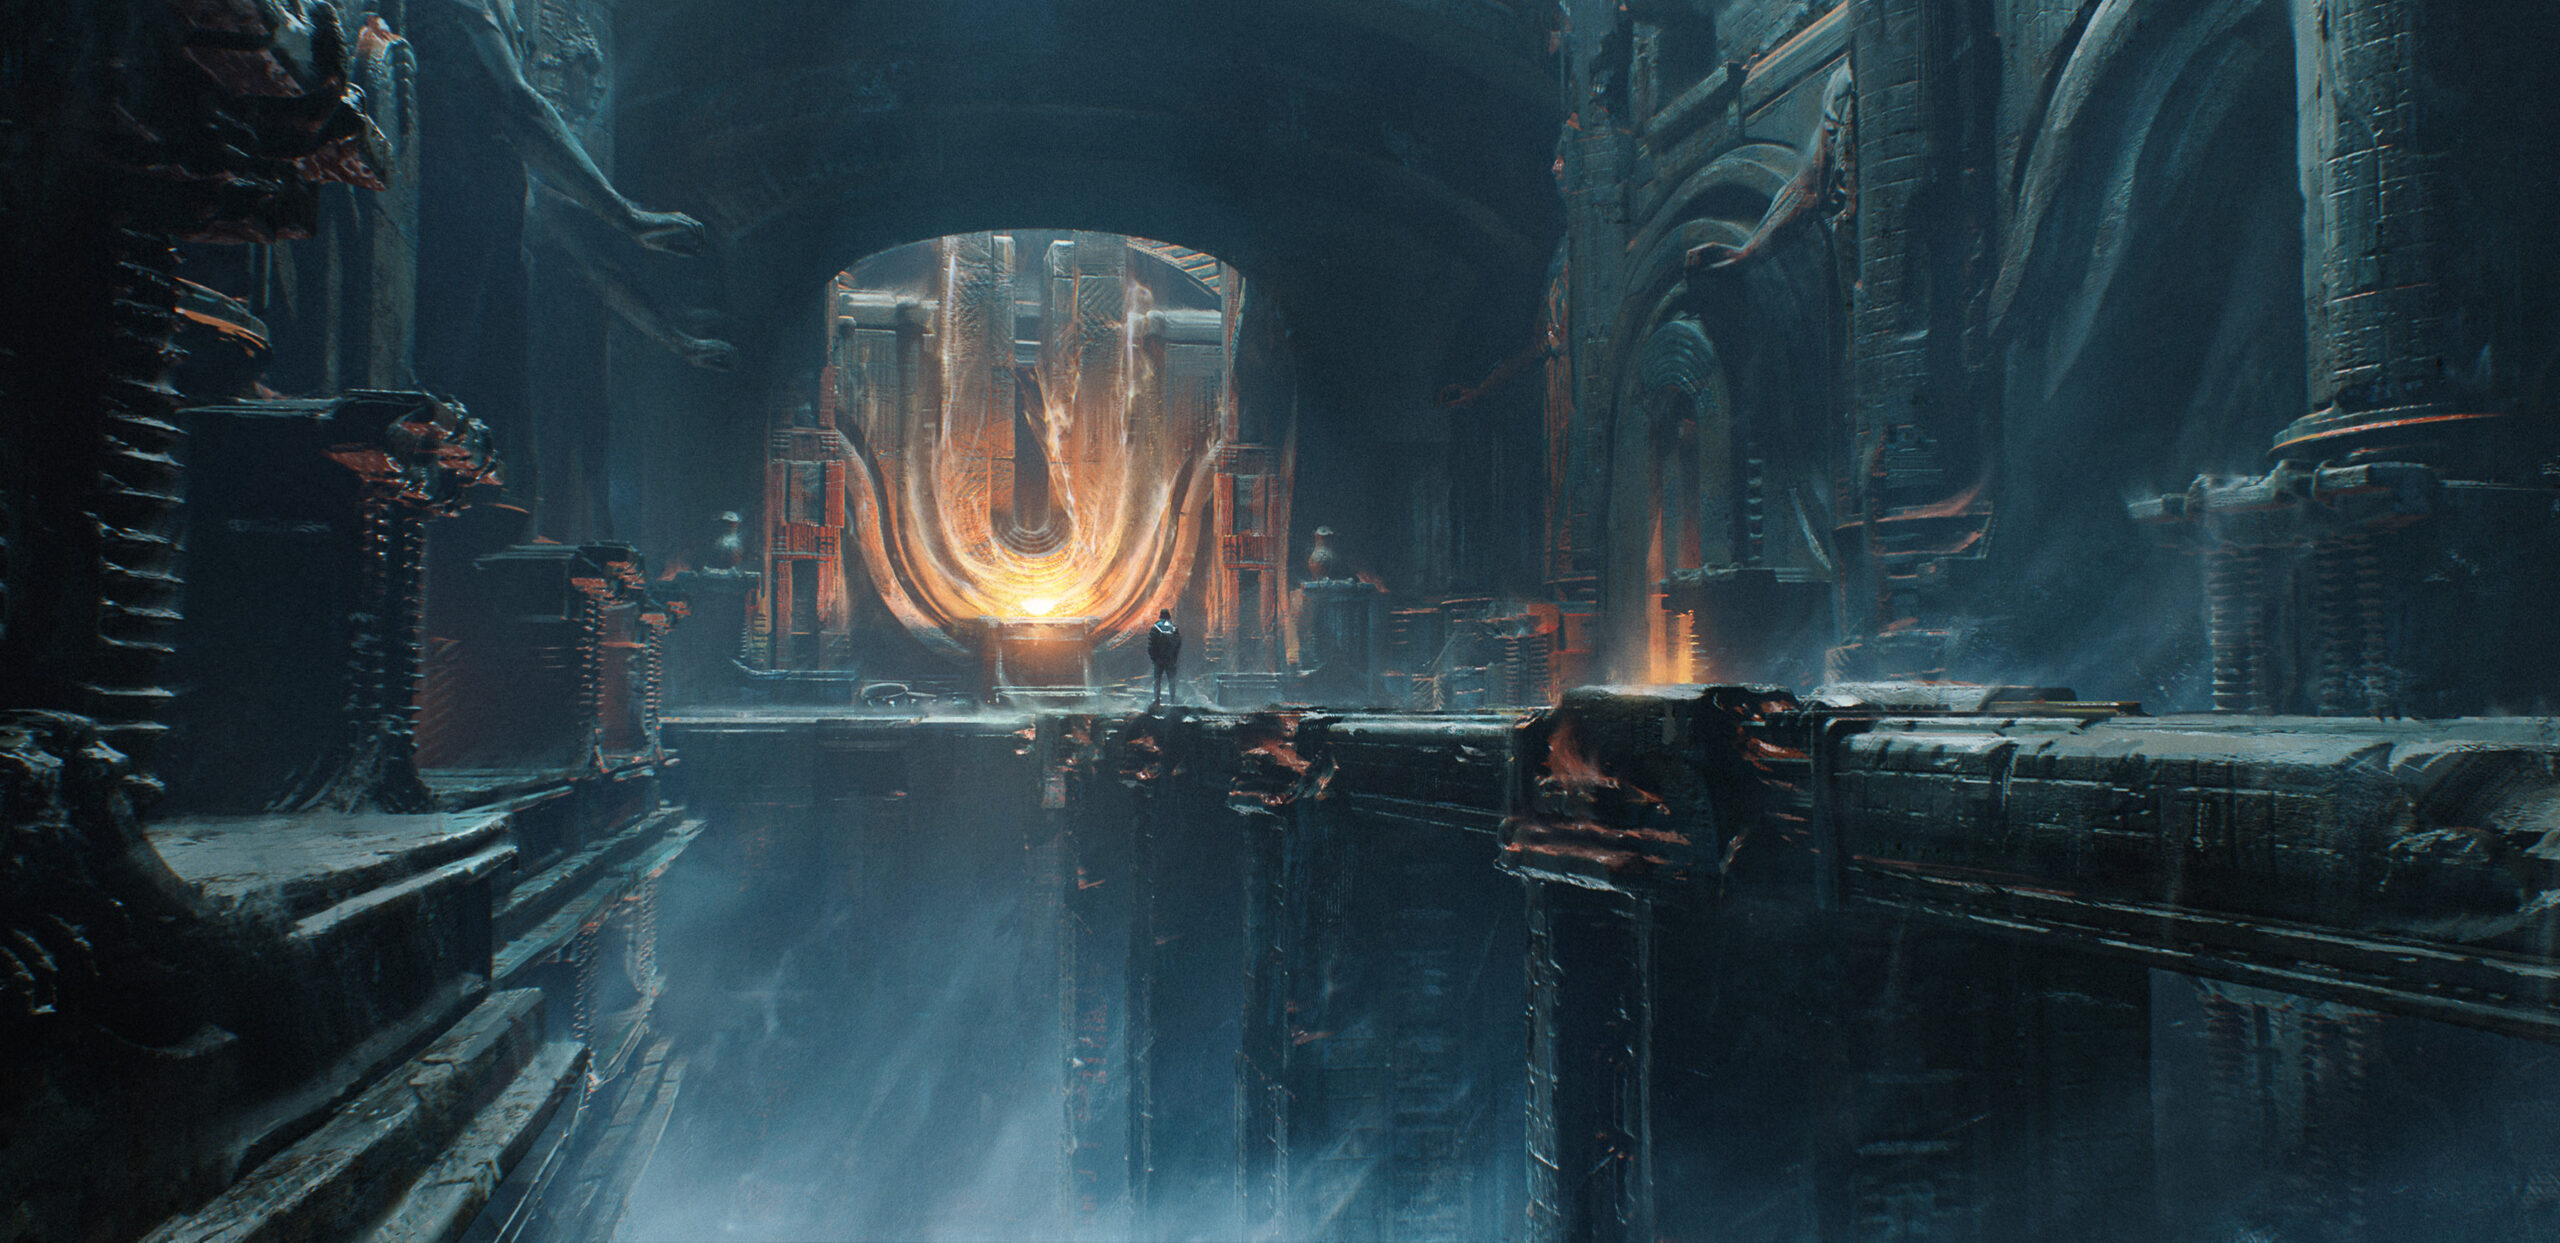 3dcoat scifi worldbuilding design photoshop concept